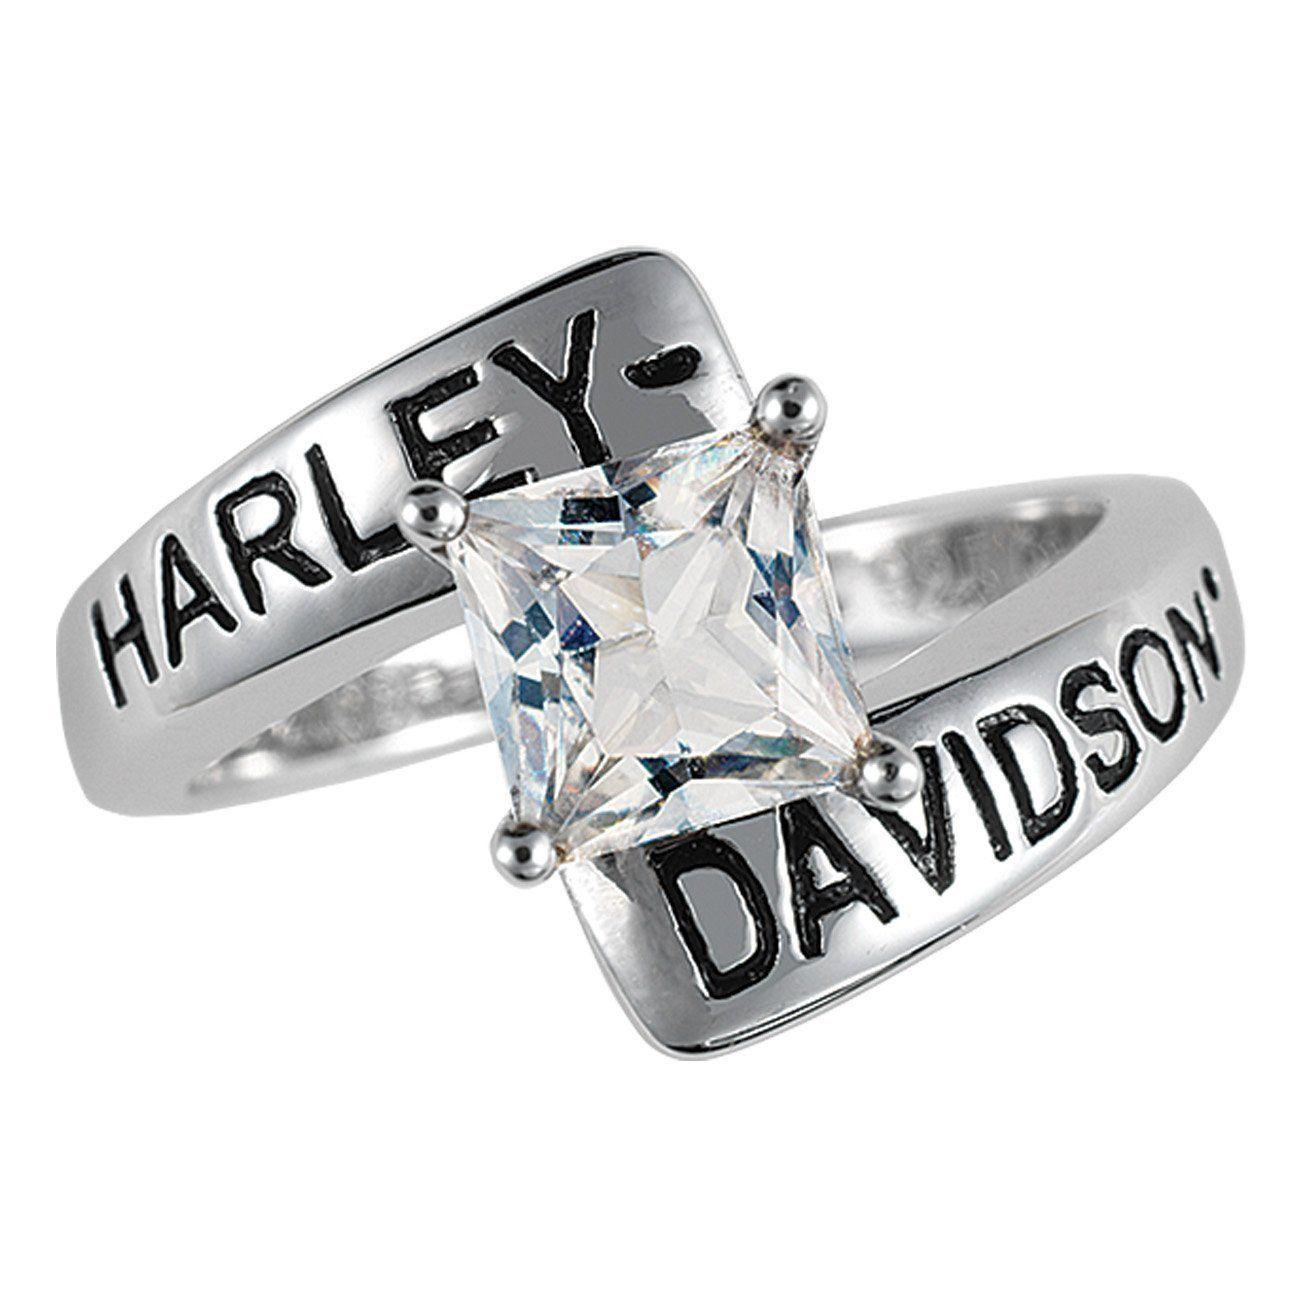 harley davidson wedding rings harley davidson wedding rings Collection Harley Davidson Rings Harley